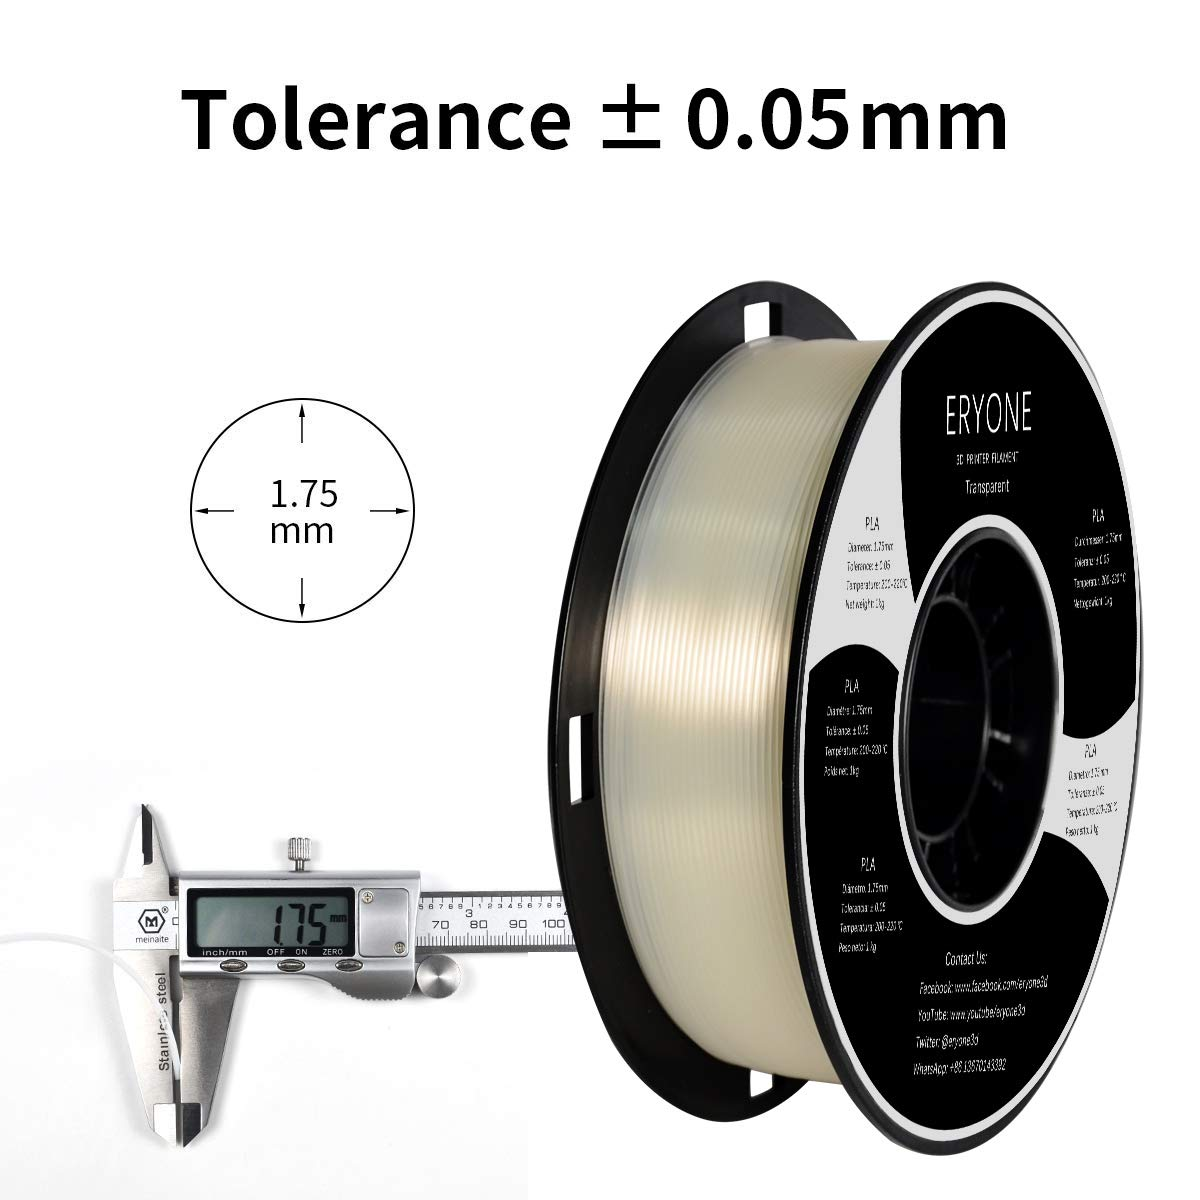 Eryone PLA Filamento 1.75mm 1kg 1 Spool Filamento PLA 1.75mm Stampante 3D Filamento PLA Per Stampante 3D Trasparente